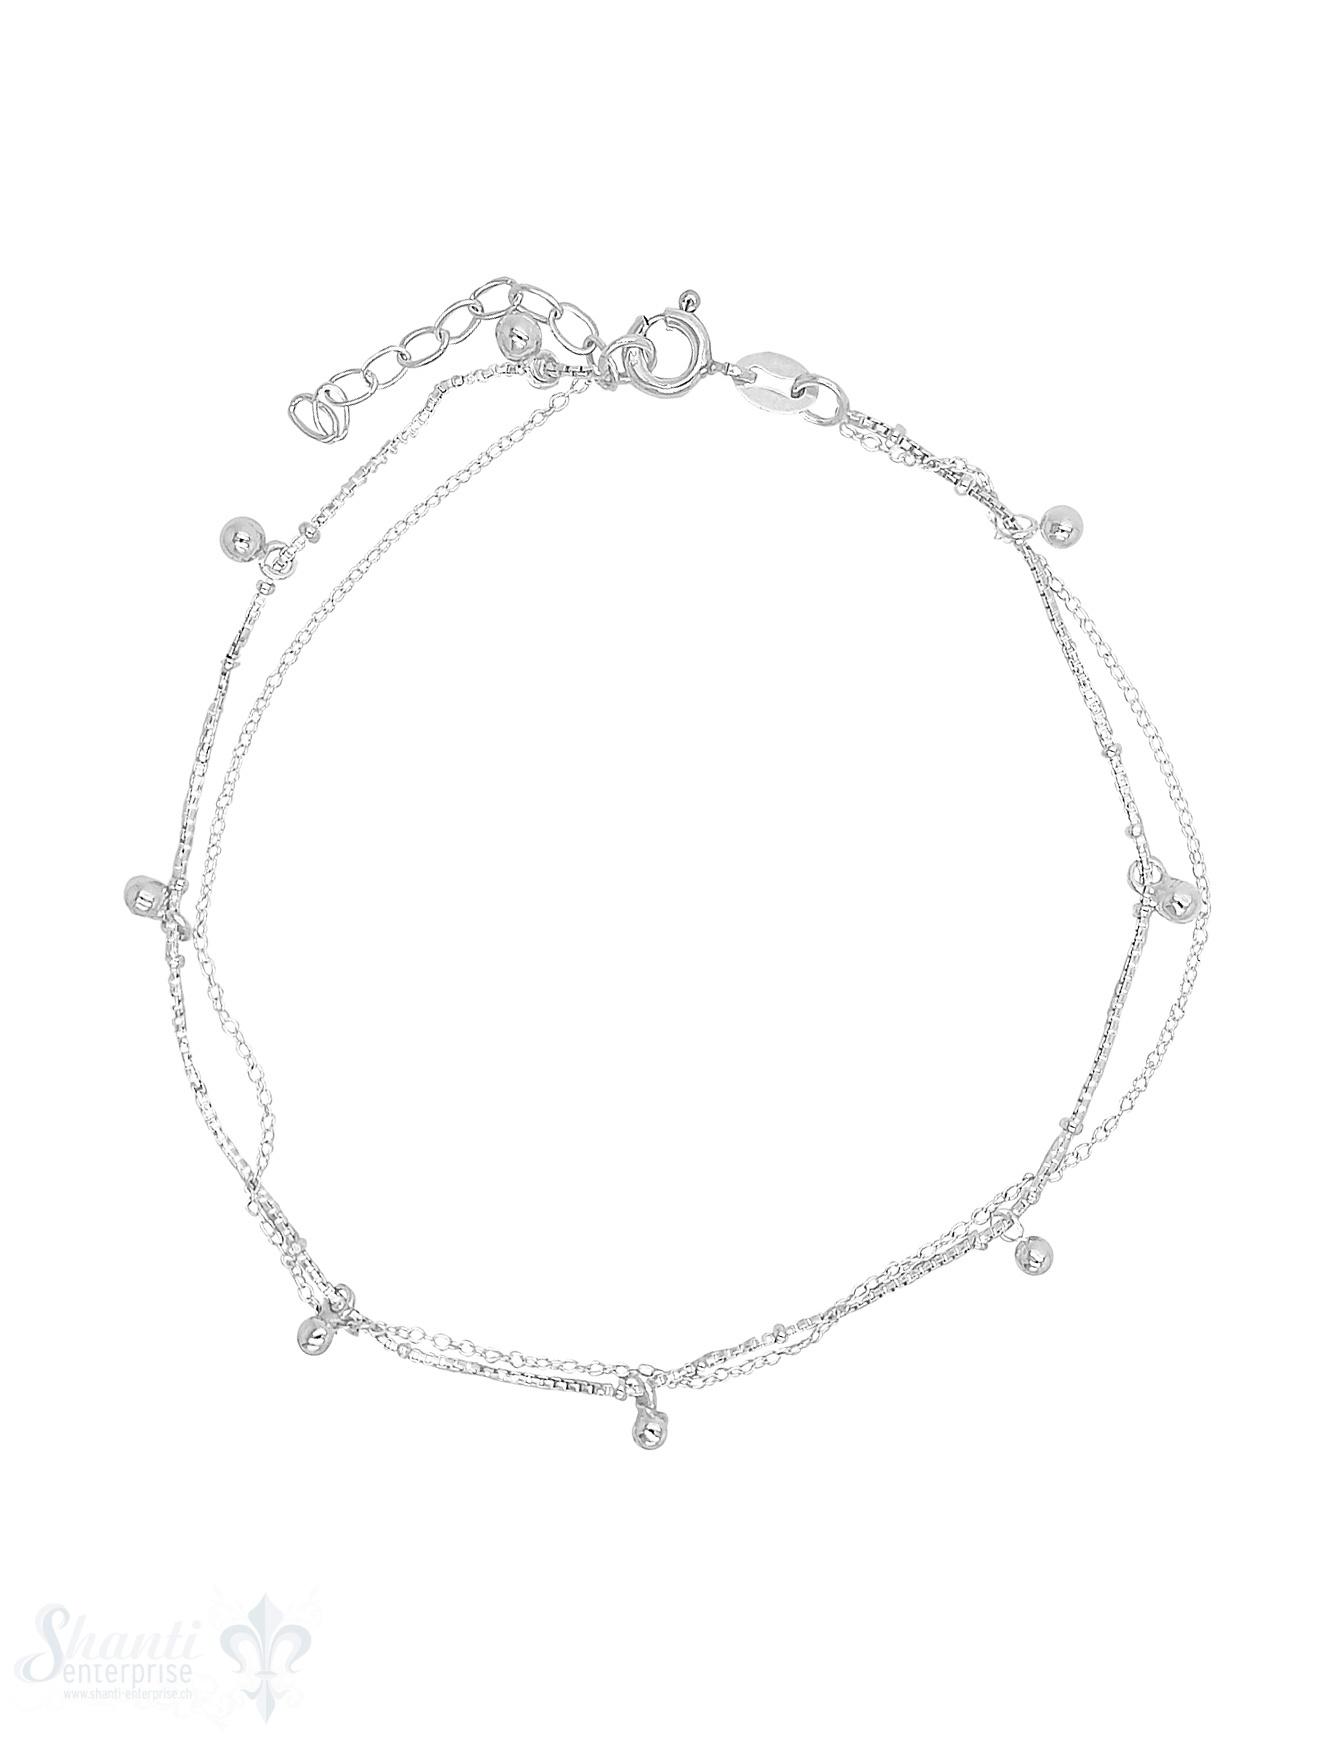 Fussketteli Silber venez./ Anker 2-reihig 23-26 cm Kügeli-Anhänger Grössen verstellbar